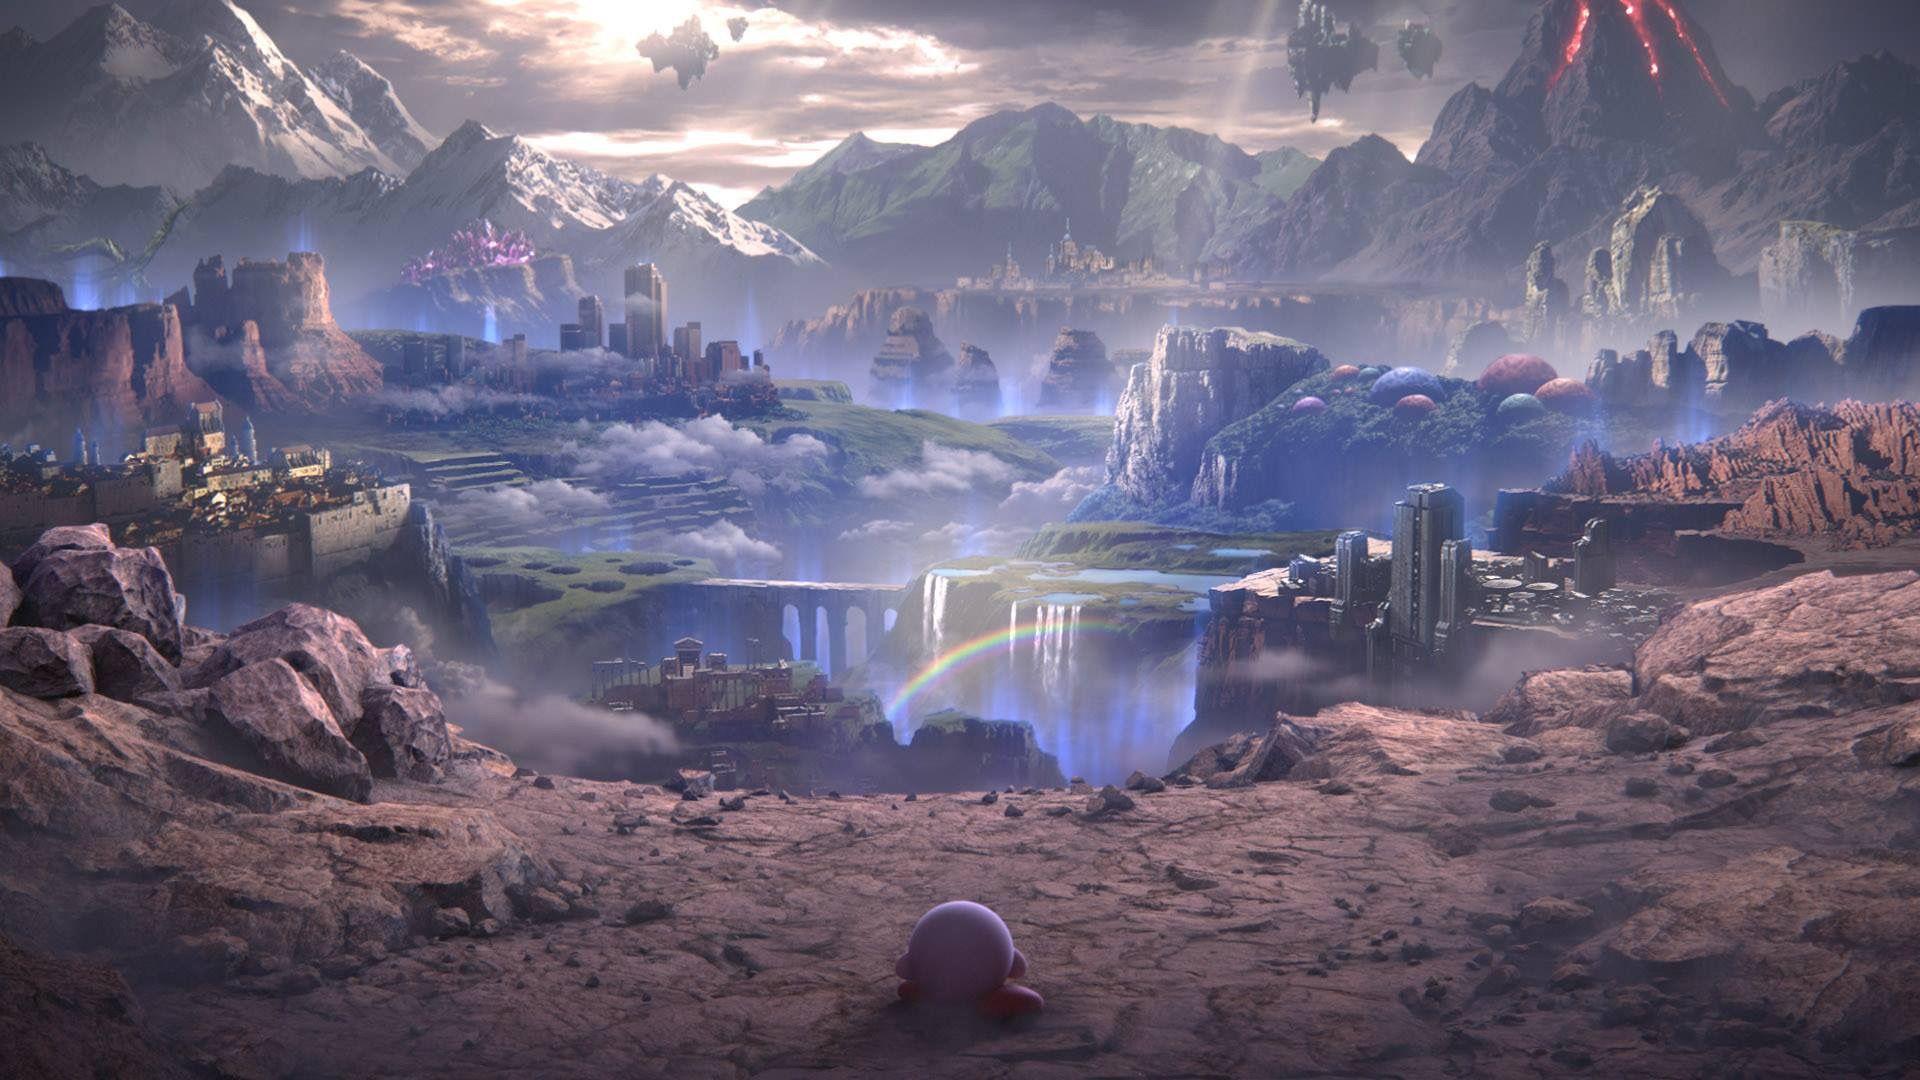 World Of Light Super Smash Bros Ultimate New Backgrounds Smash Bros Super Smash Bros